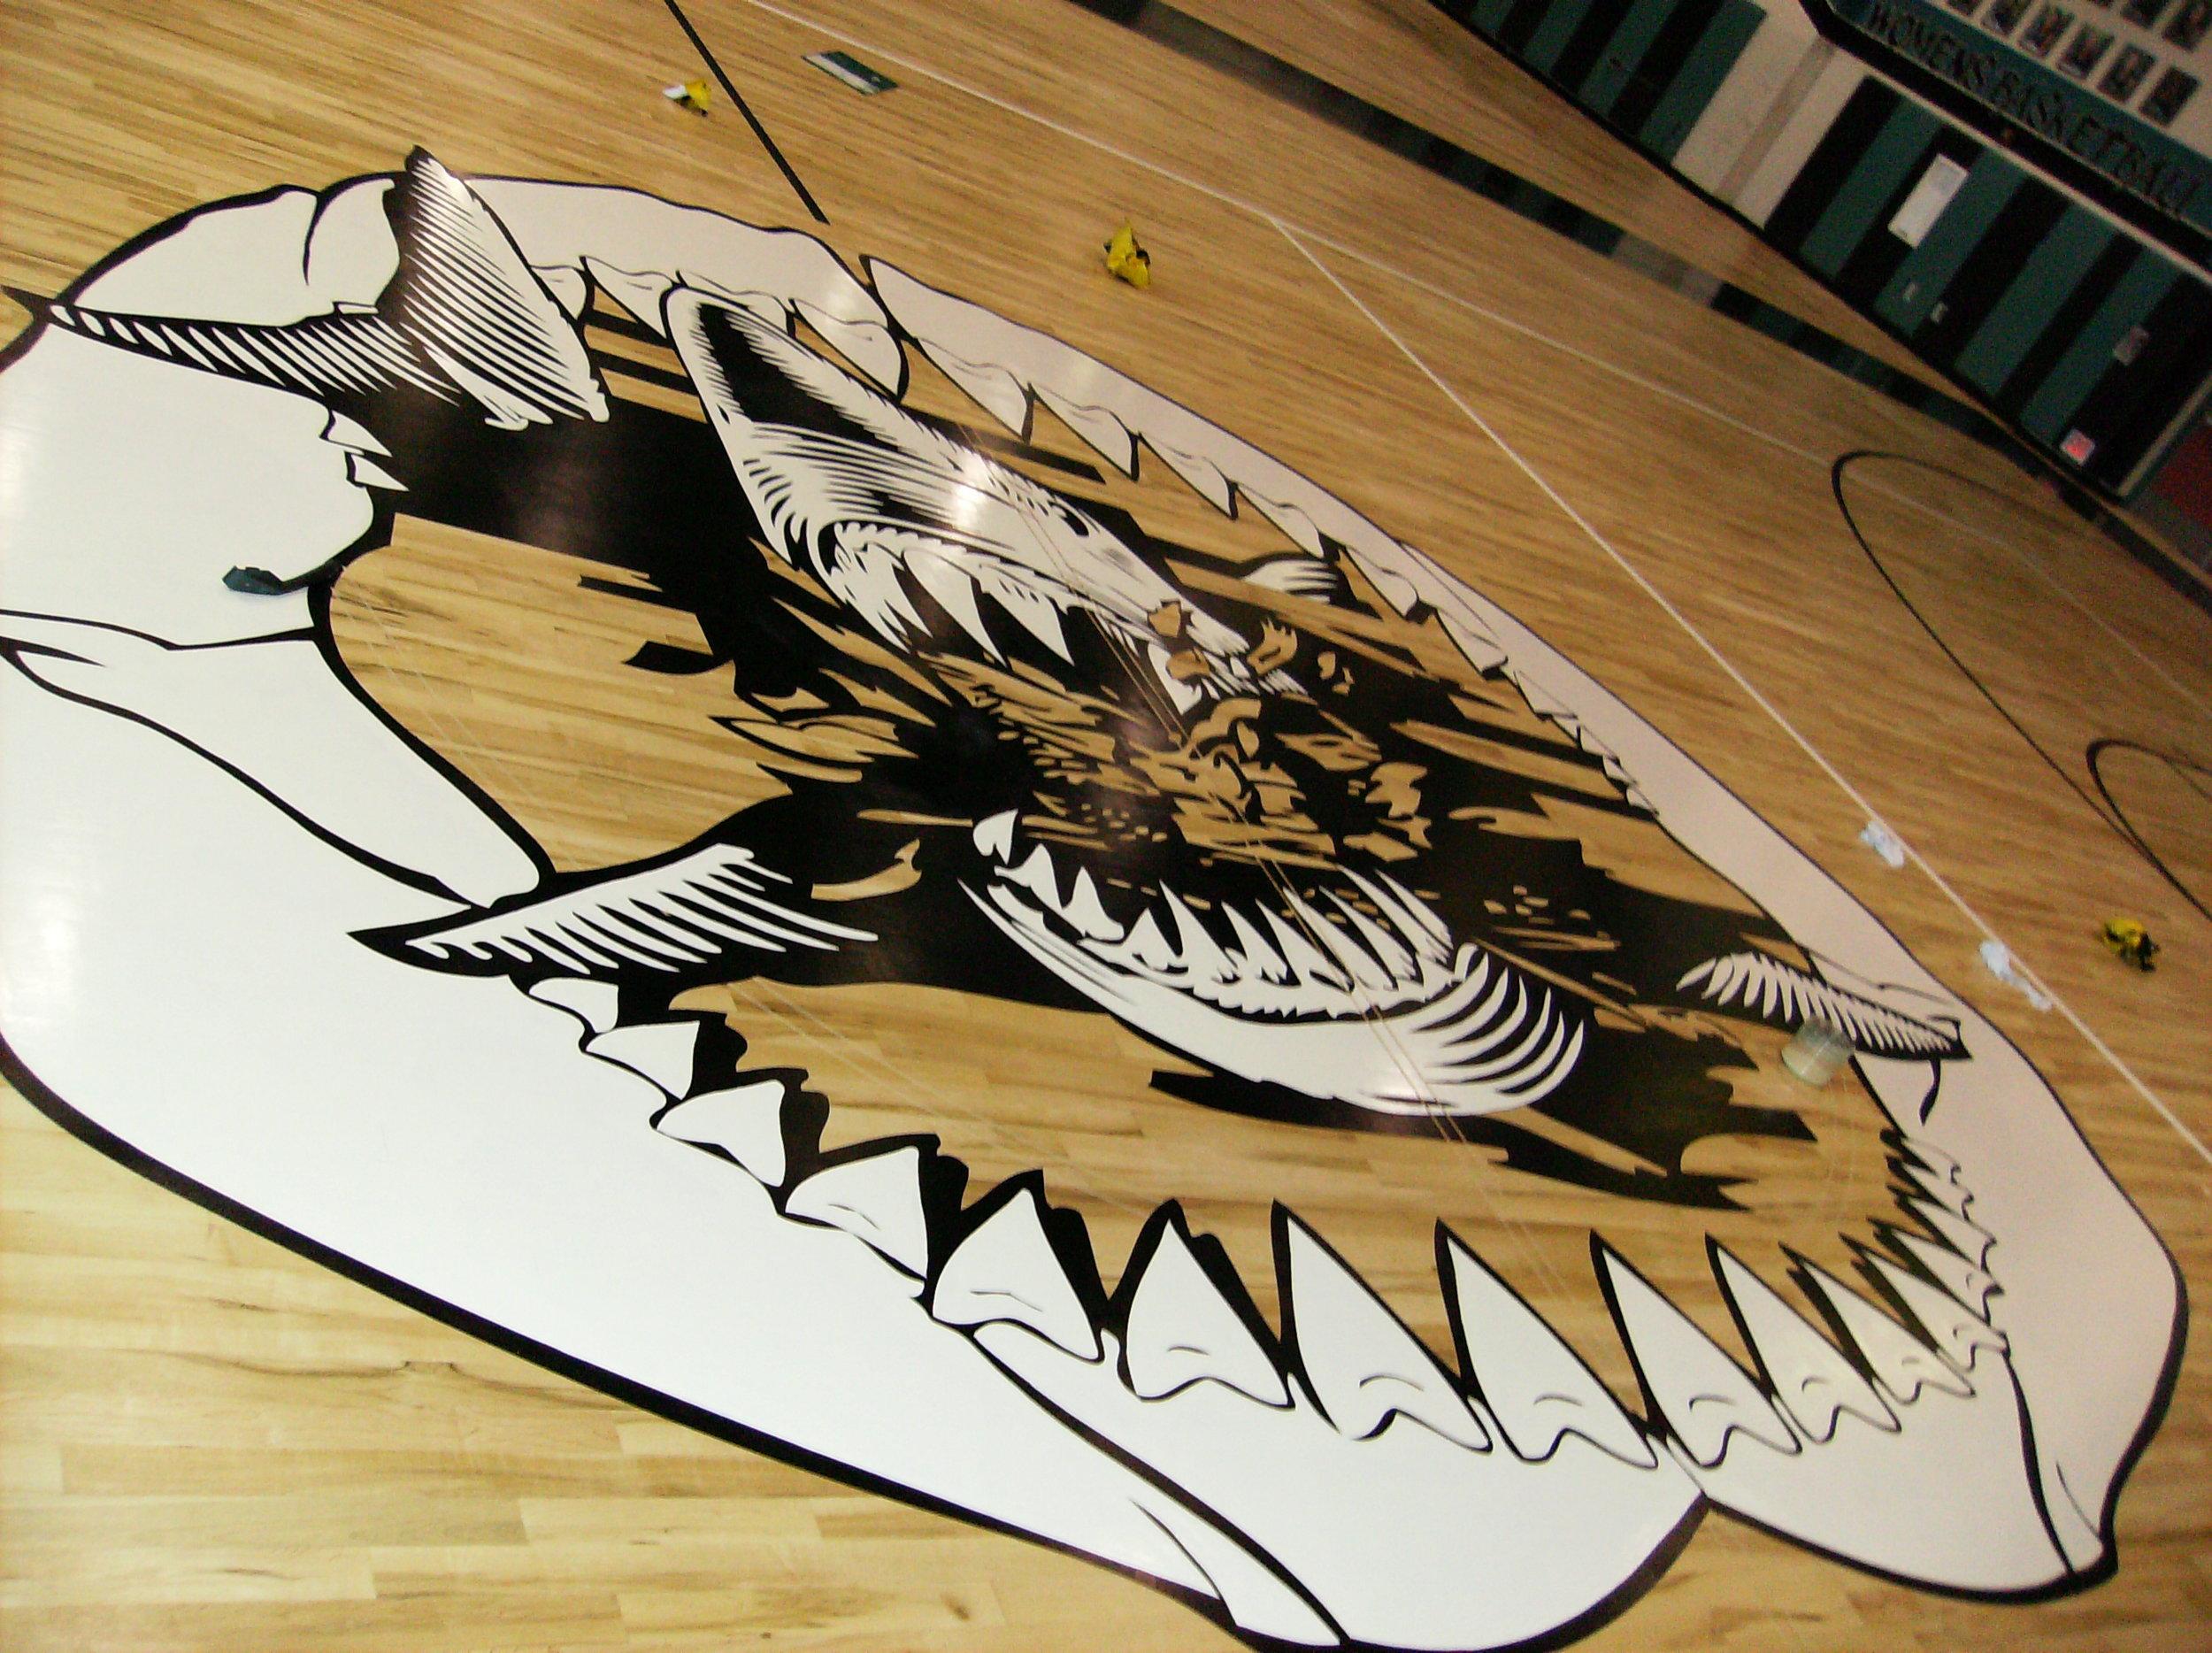 Santiago High School gym wood floor hand painted graphics